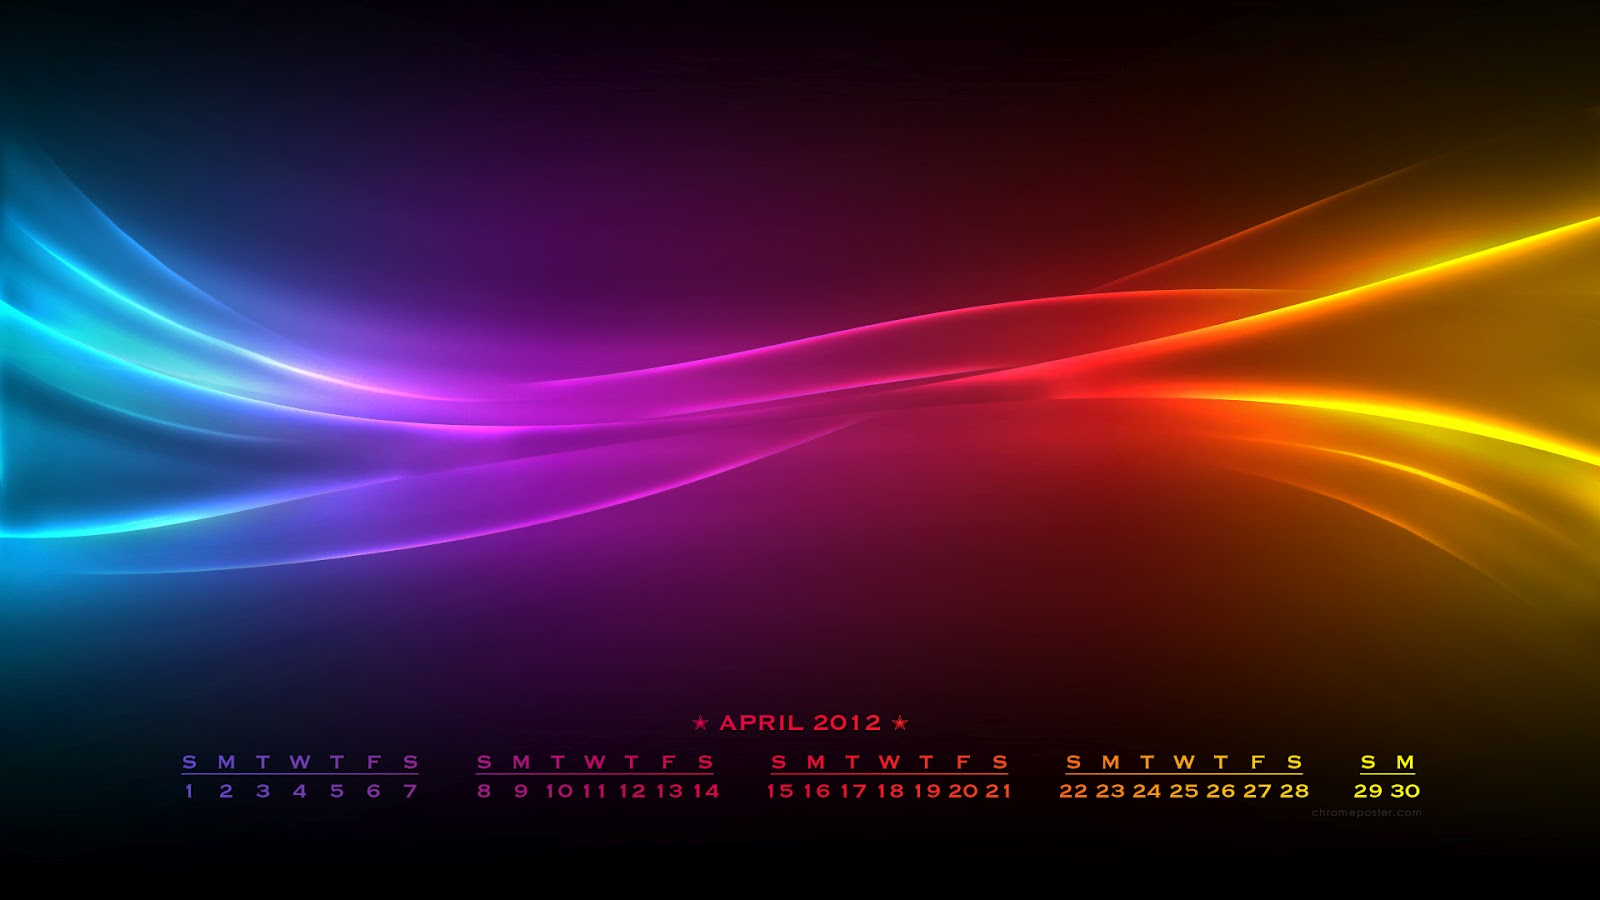 http://1.bp.blogspot.com/-i3y7AlHSn68/T3SLbaWC7PI/AAAAAAAAGhk/8HchilUsWR4/s1600/Color-Pulse-1920-x-1080.jpg